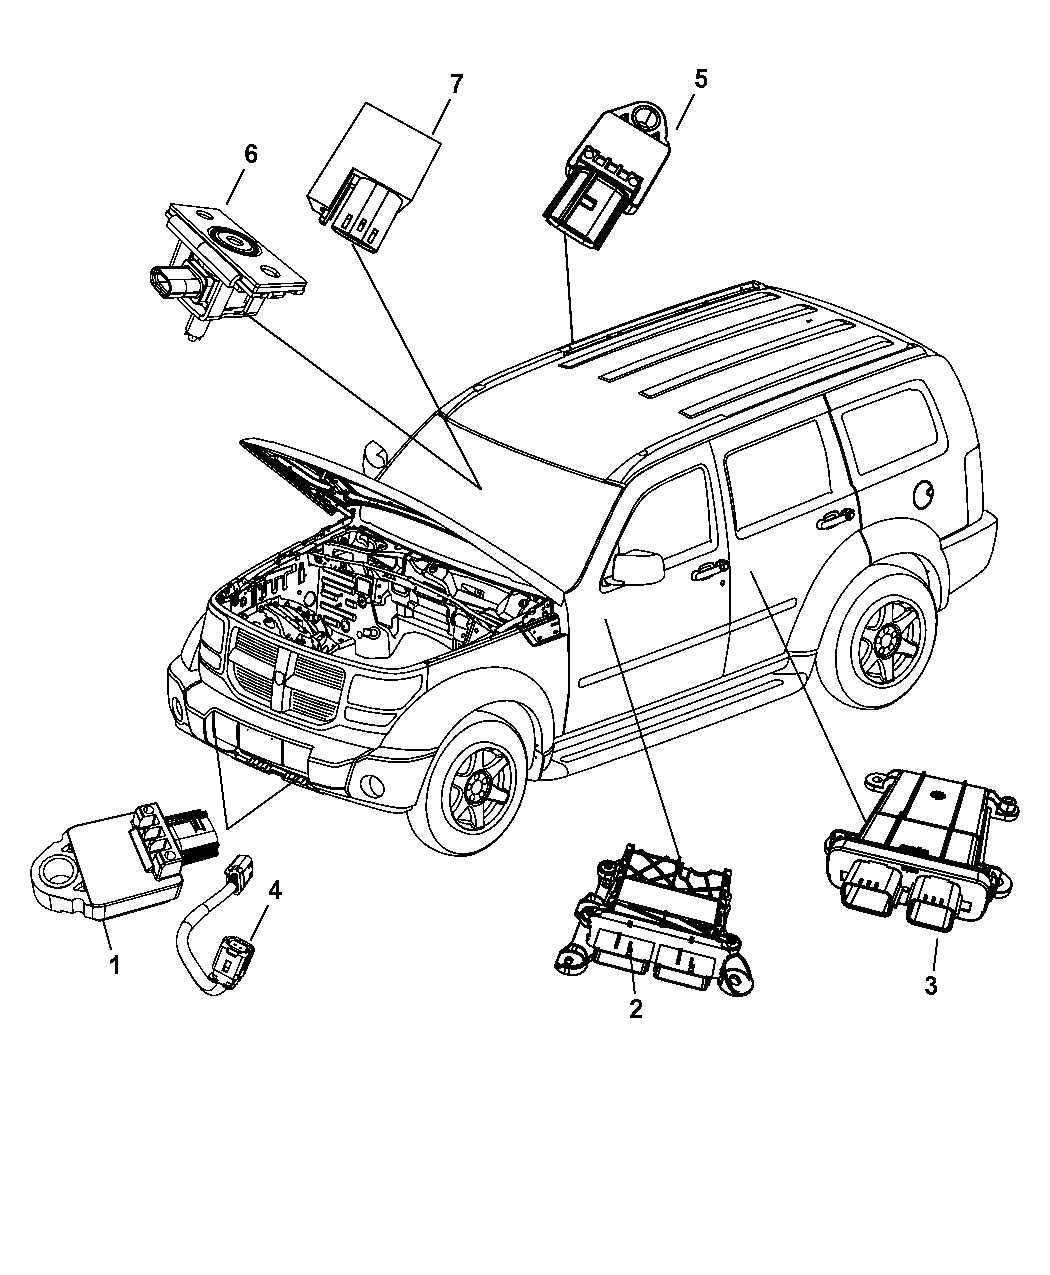 2007 Dodge Nitro Parts Manual